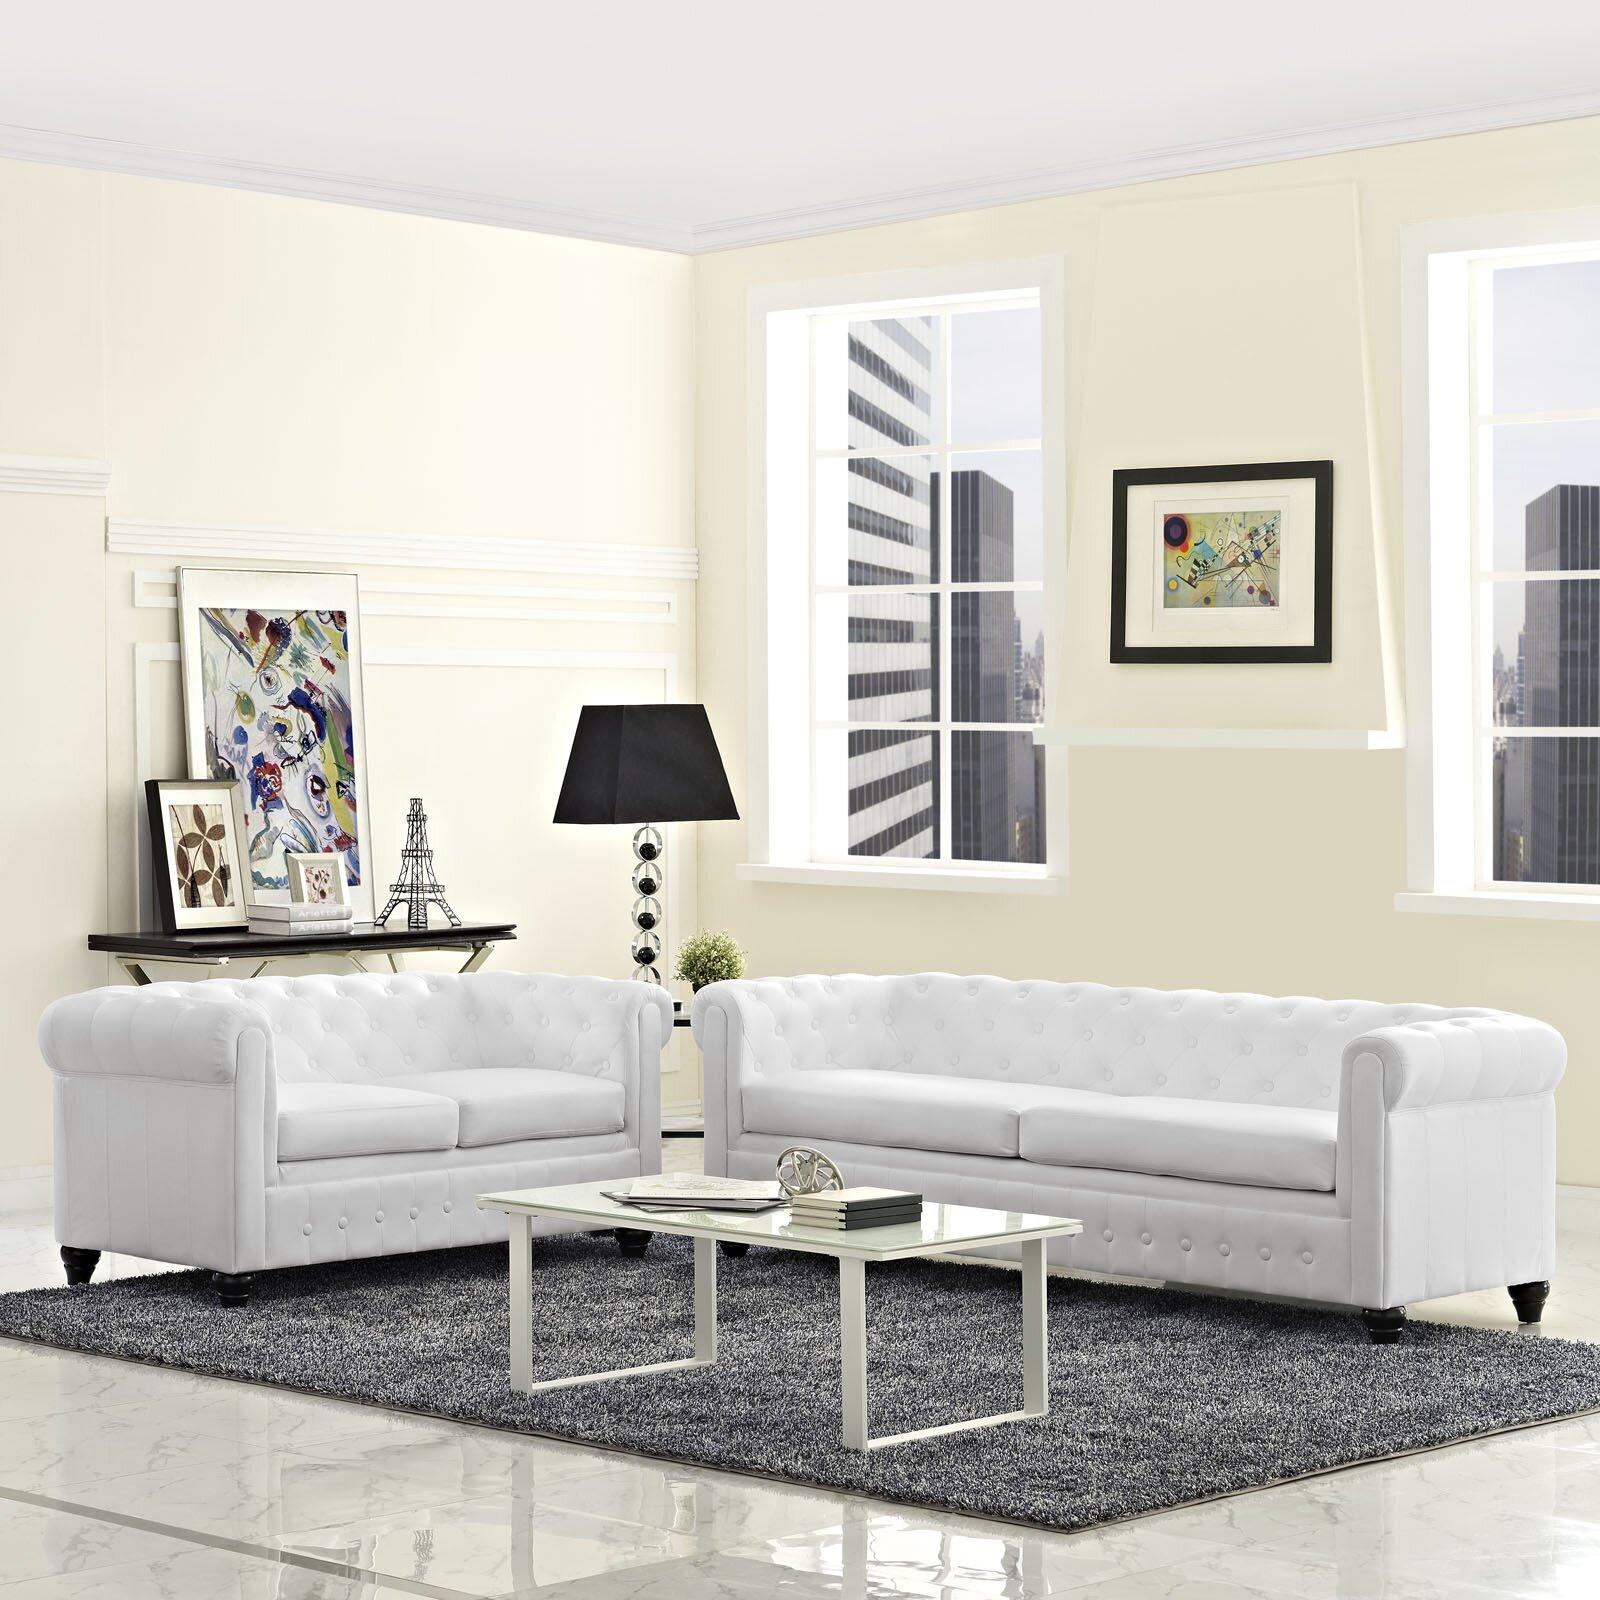 Modway earl 2 piece living room set reviews - Piece living room set ...